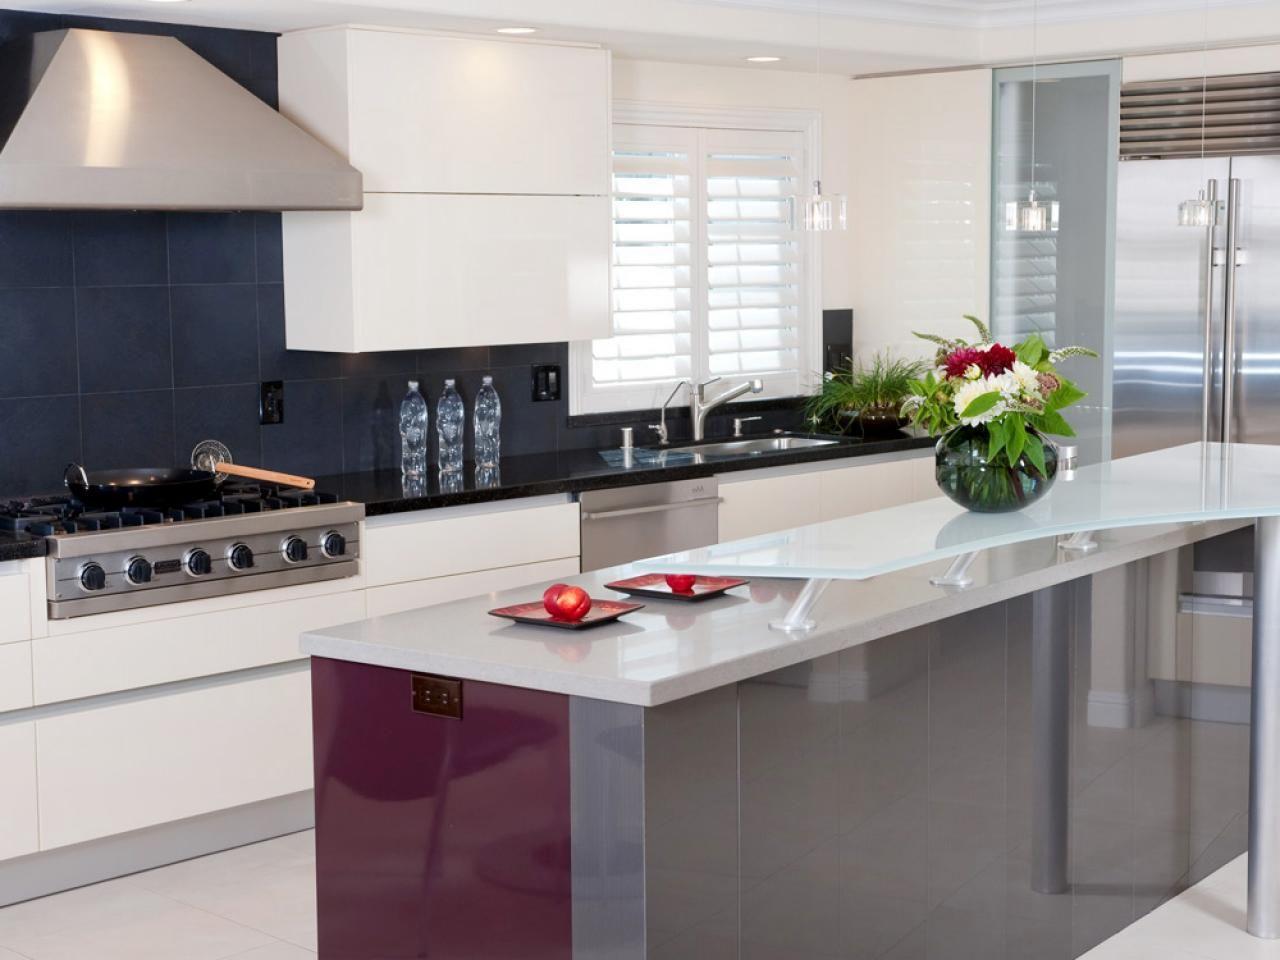 Beyond Granite Kitchen Countertop Alternatives Pinterest - Cheap kitchen countertops alternatives